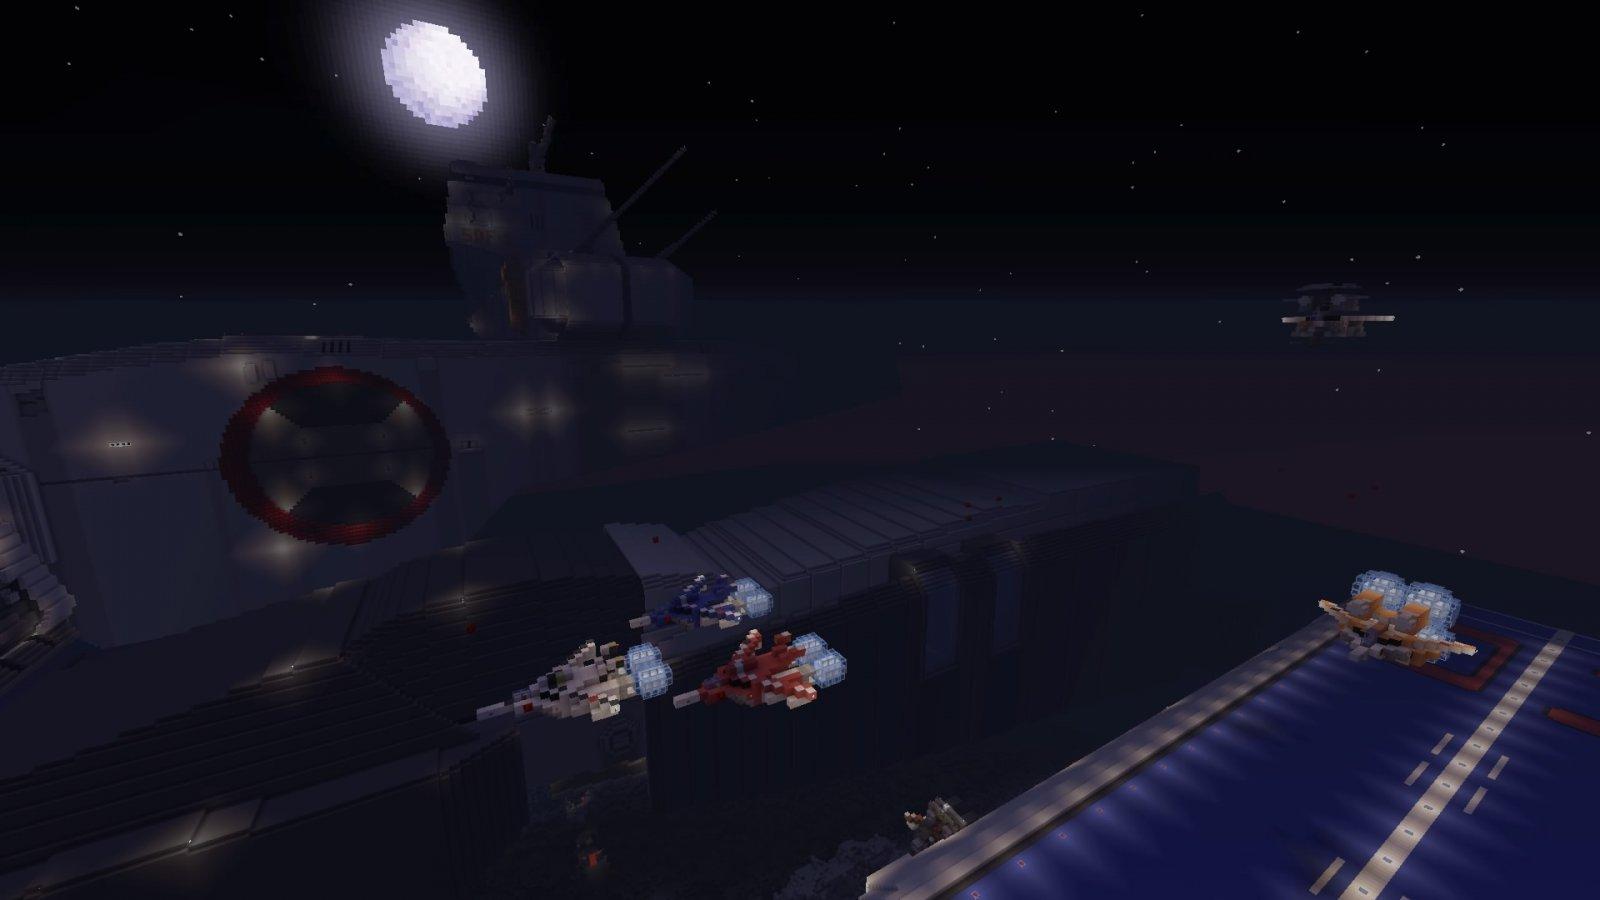 Port Side at night